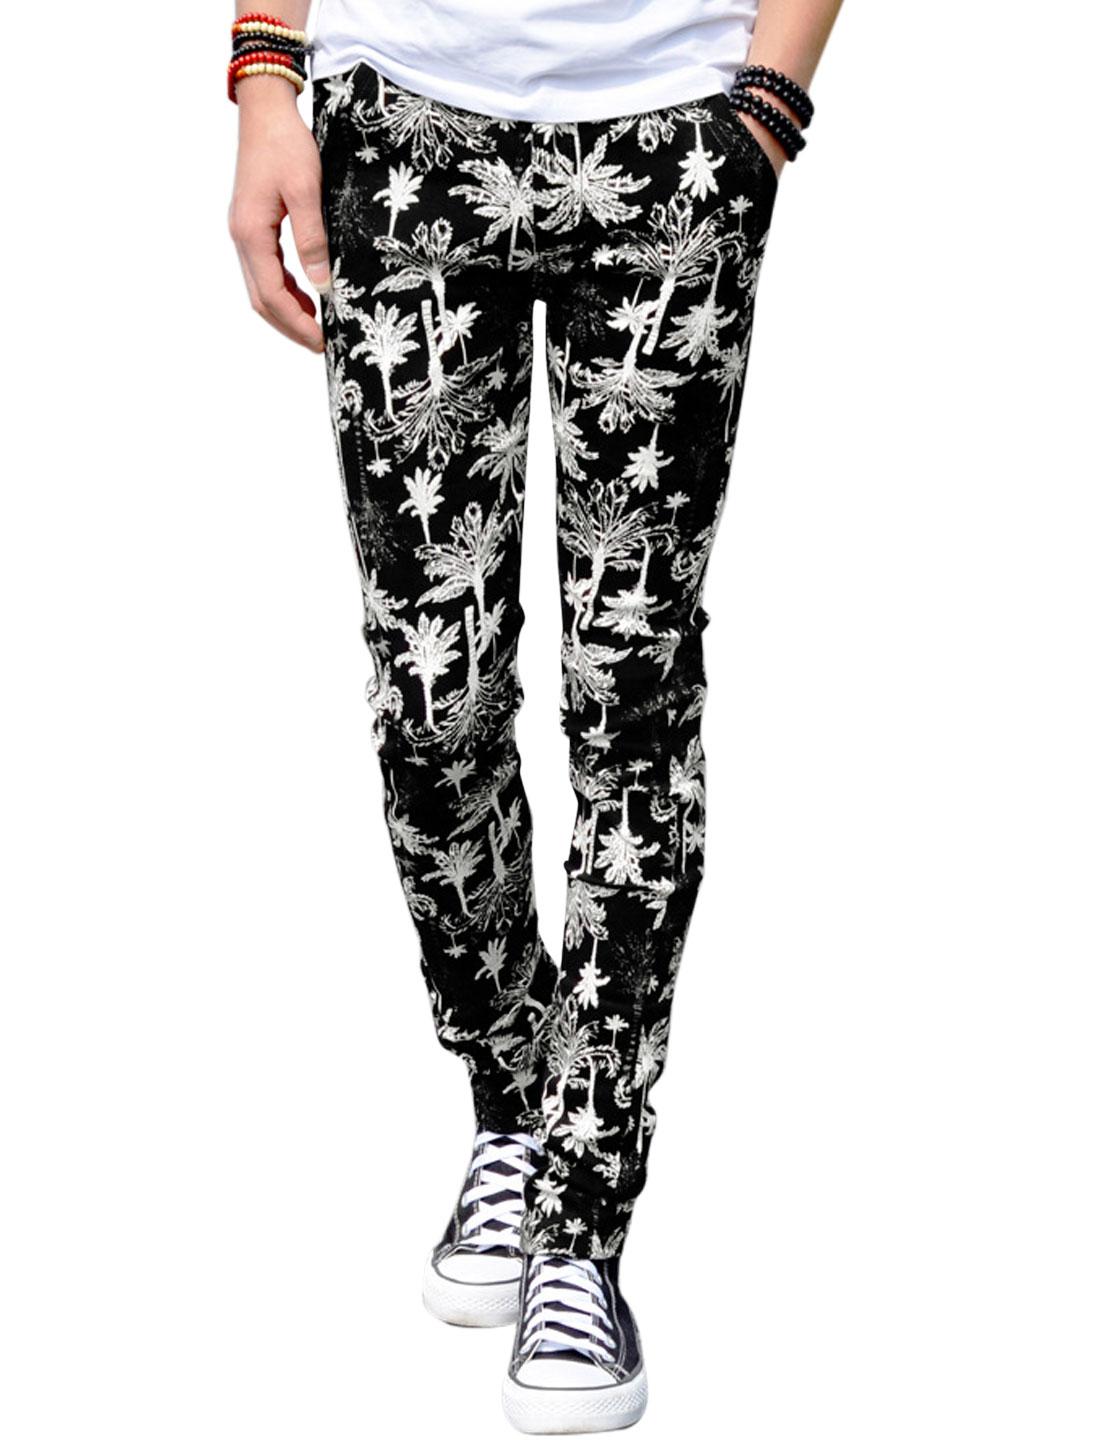 Men Trees Pattern Mid Rise Slim Fit Zip Fly Casual Pants Black W28